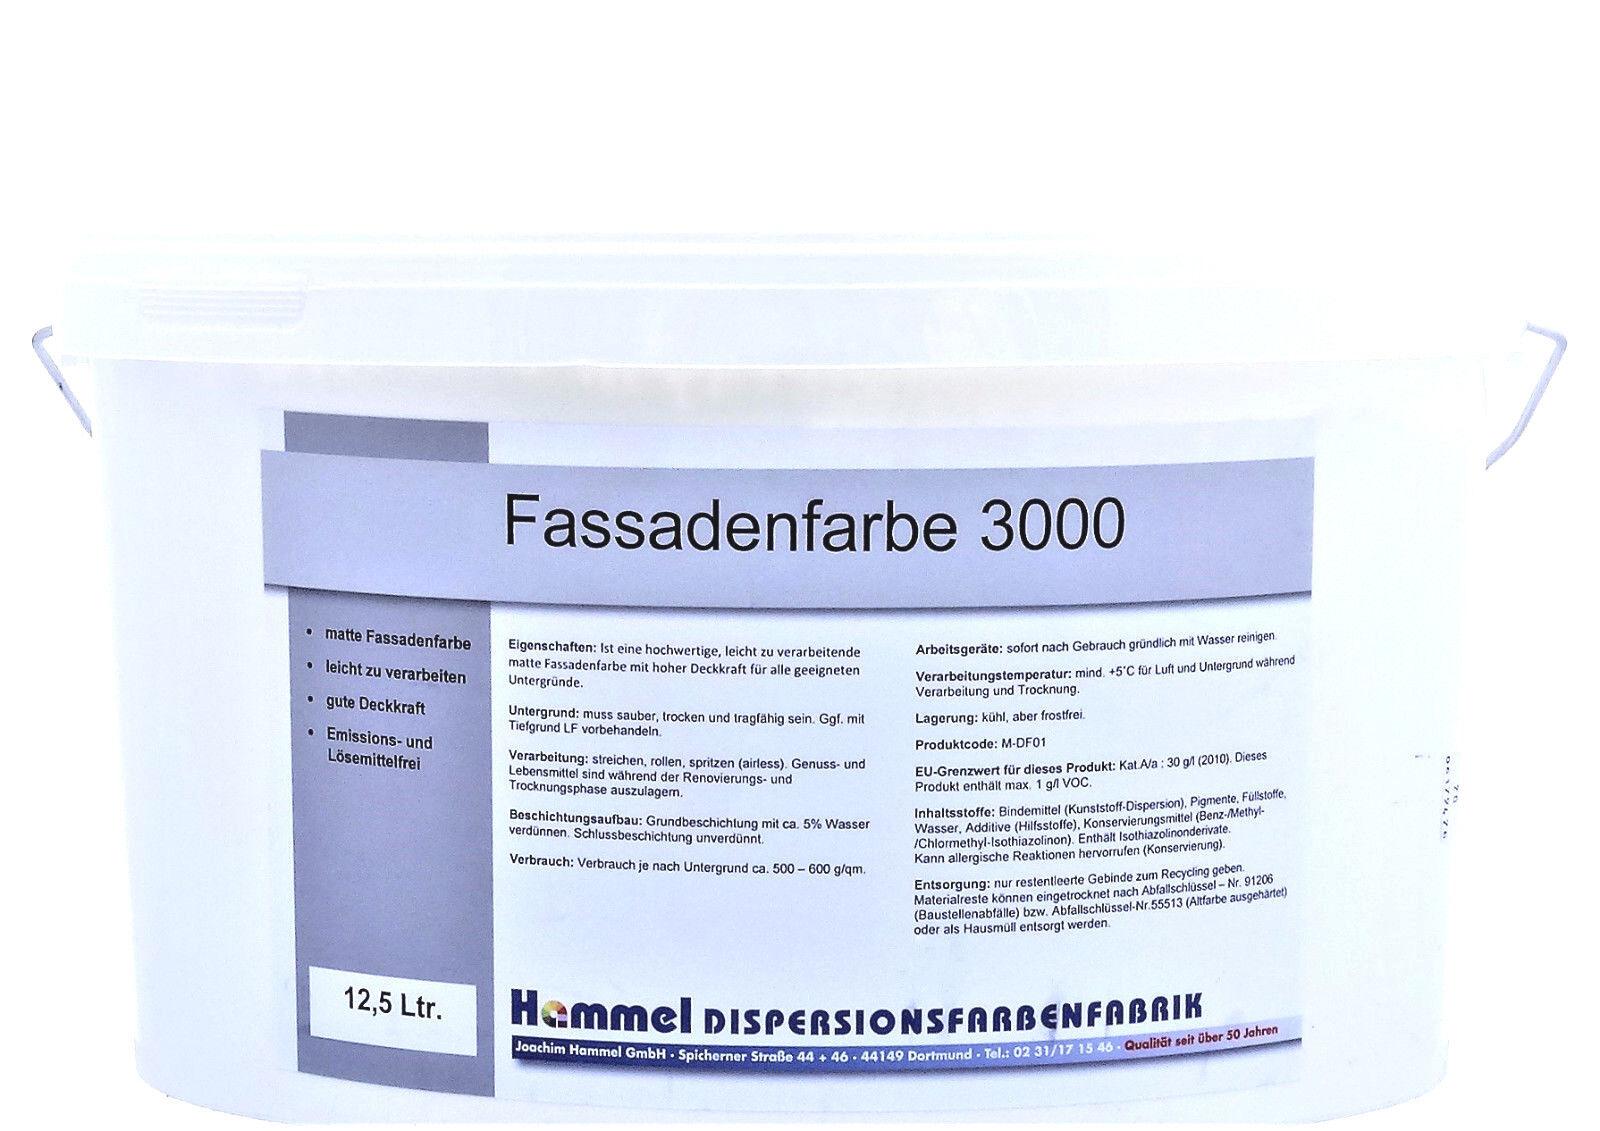 ( /L) 12,5 L FASSADENFARBE 3000 - RAL 9016 - VERKEHRSWEISS - MATT -